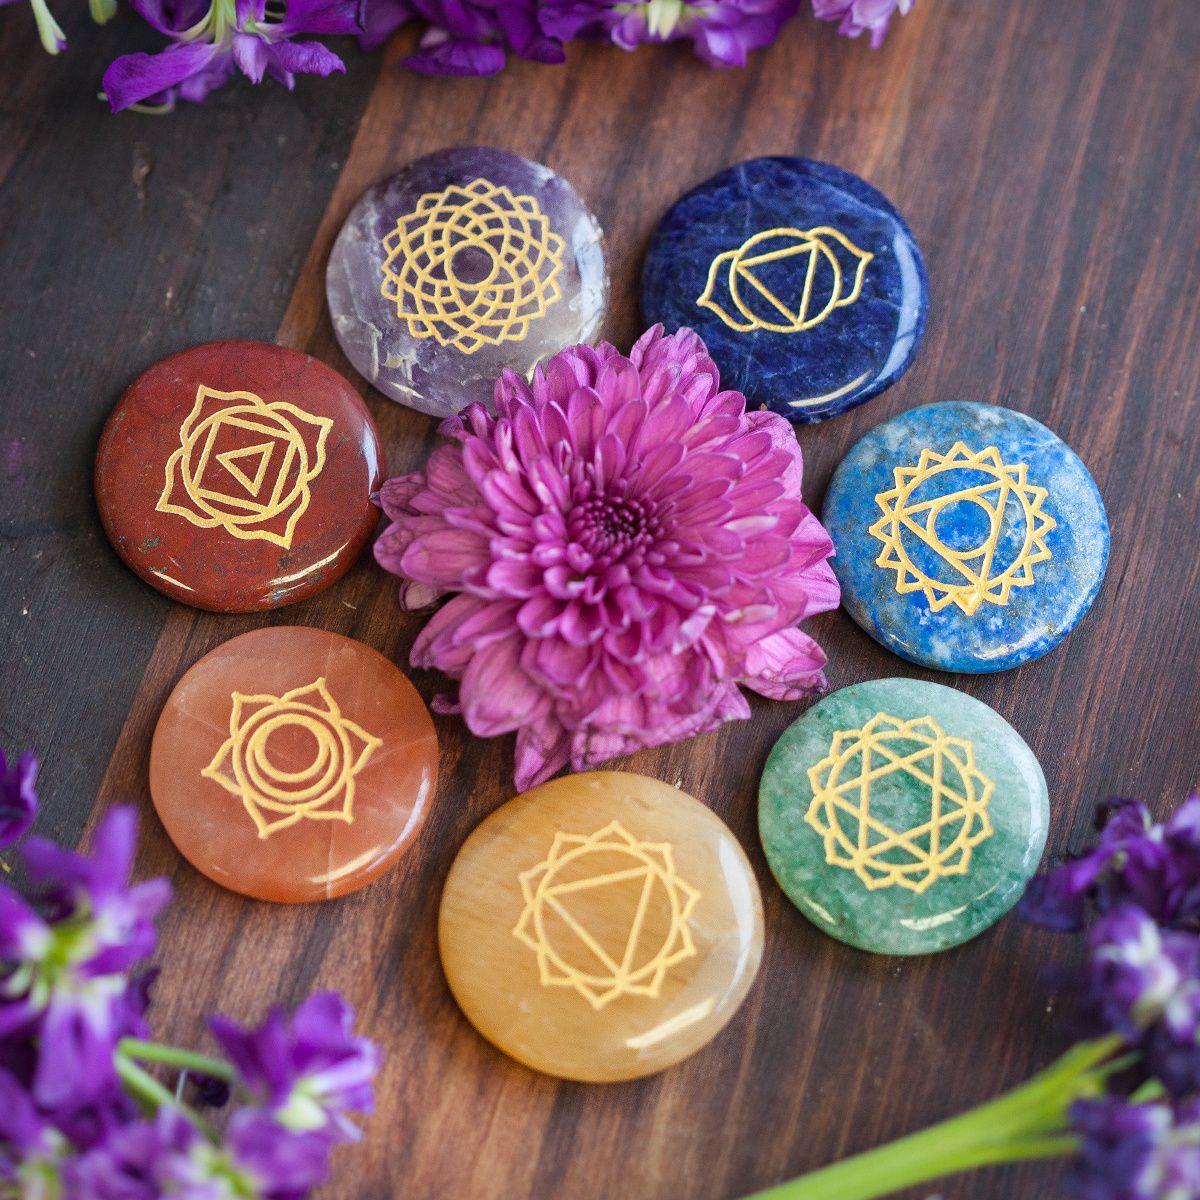 Seven Chakras Of Life